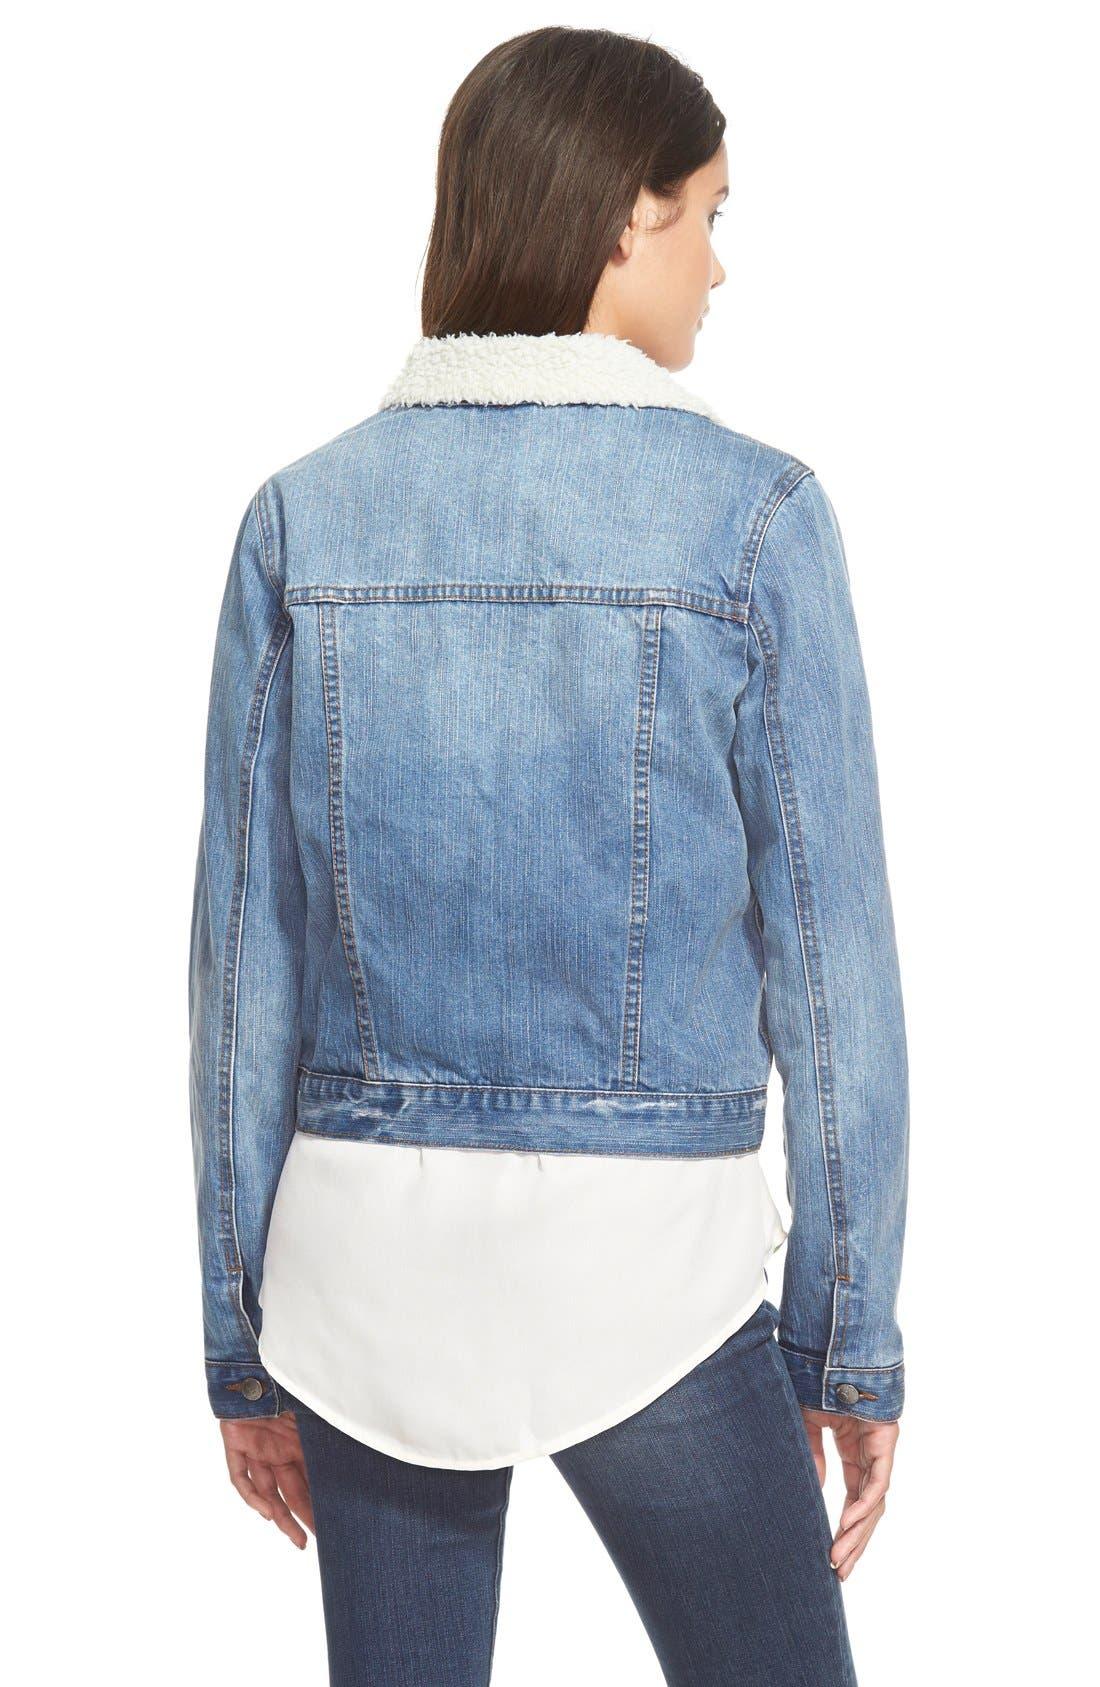 Alternate Image 3  - Thread & Supply 'Santa Fe' Denim Jacket (Juniors)